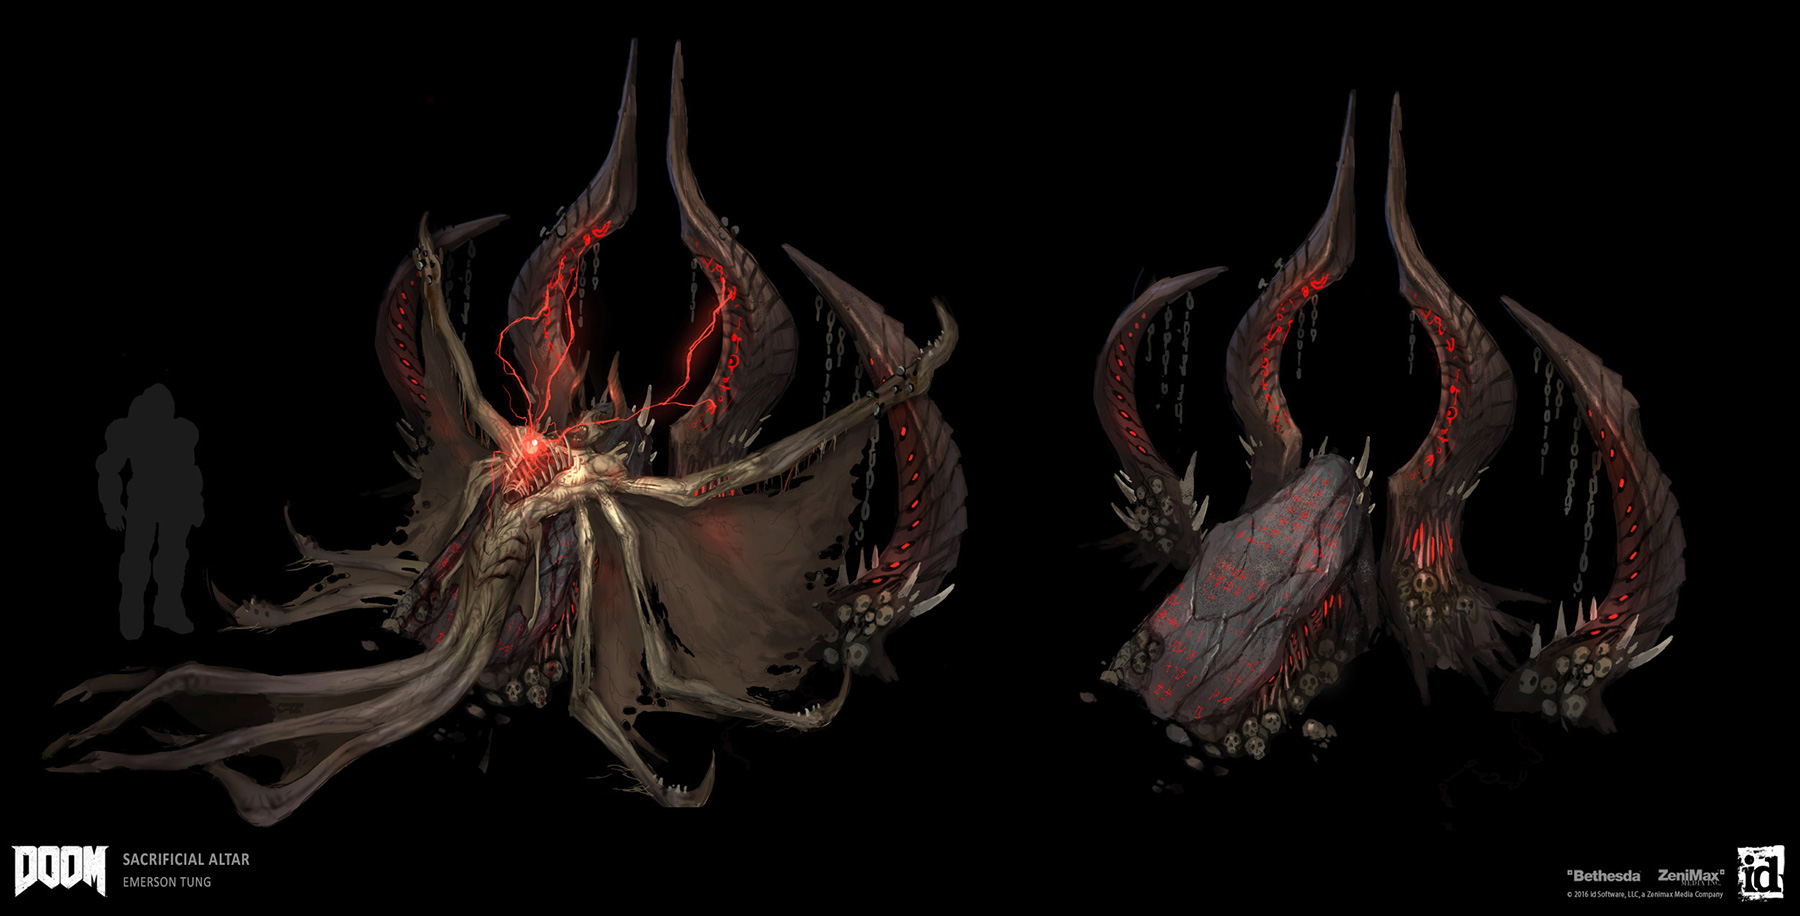 Doom Concept Art Emerson Tung